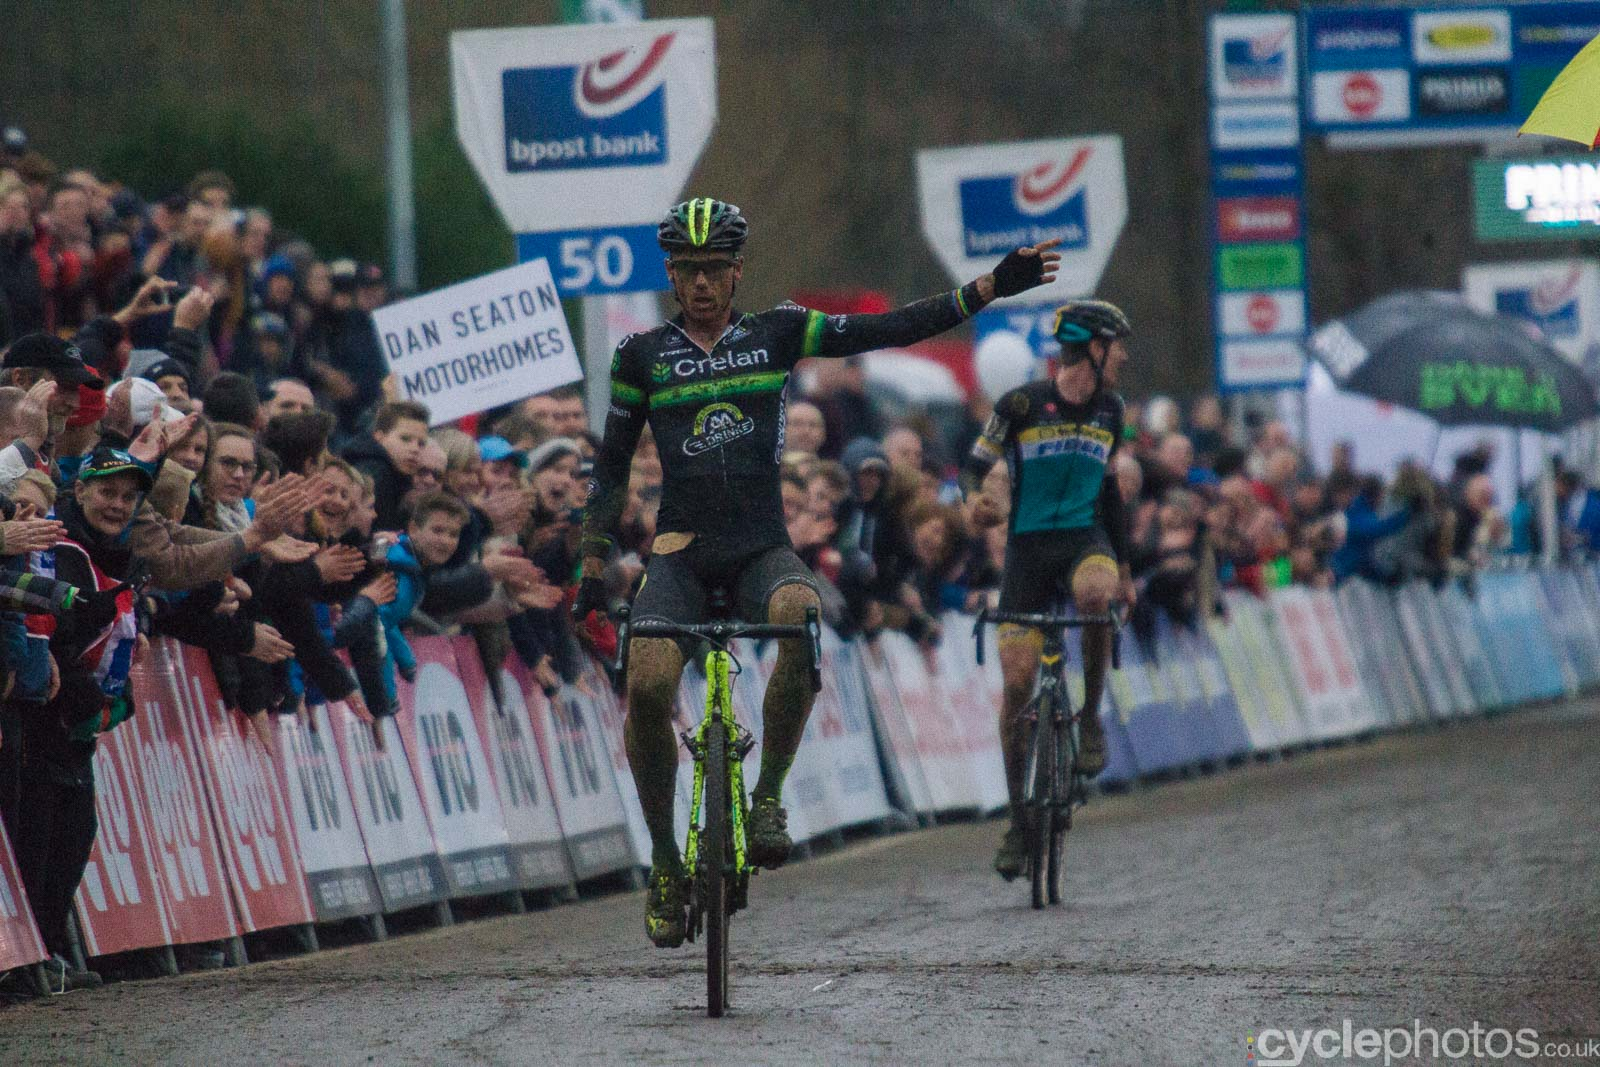 2016-cyclephotos-cyclocross-gpsvennys-160254-dan-seaton-motorhomes